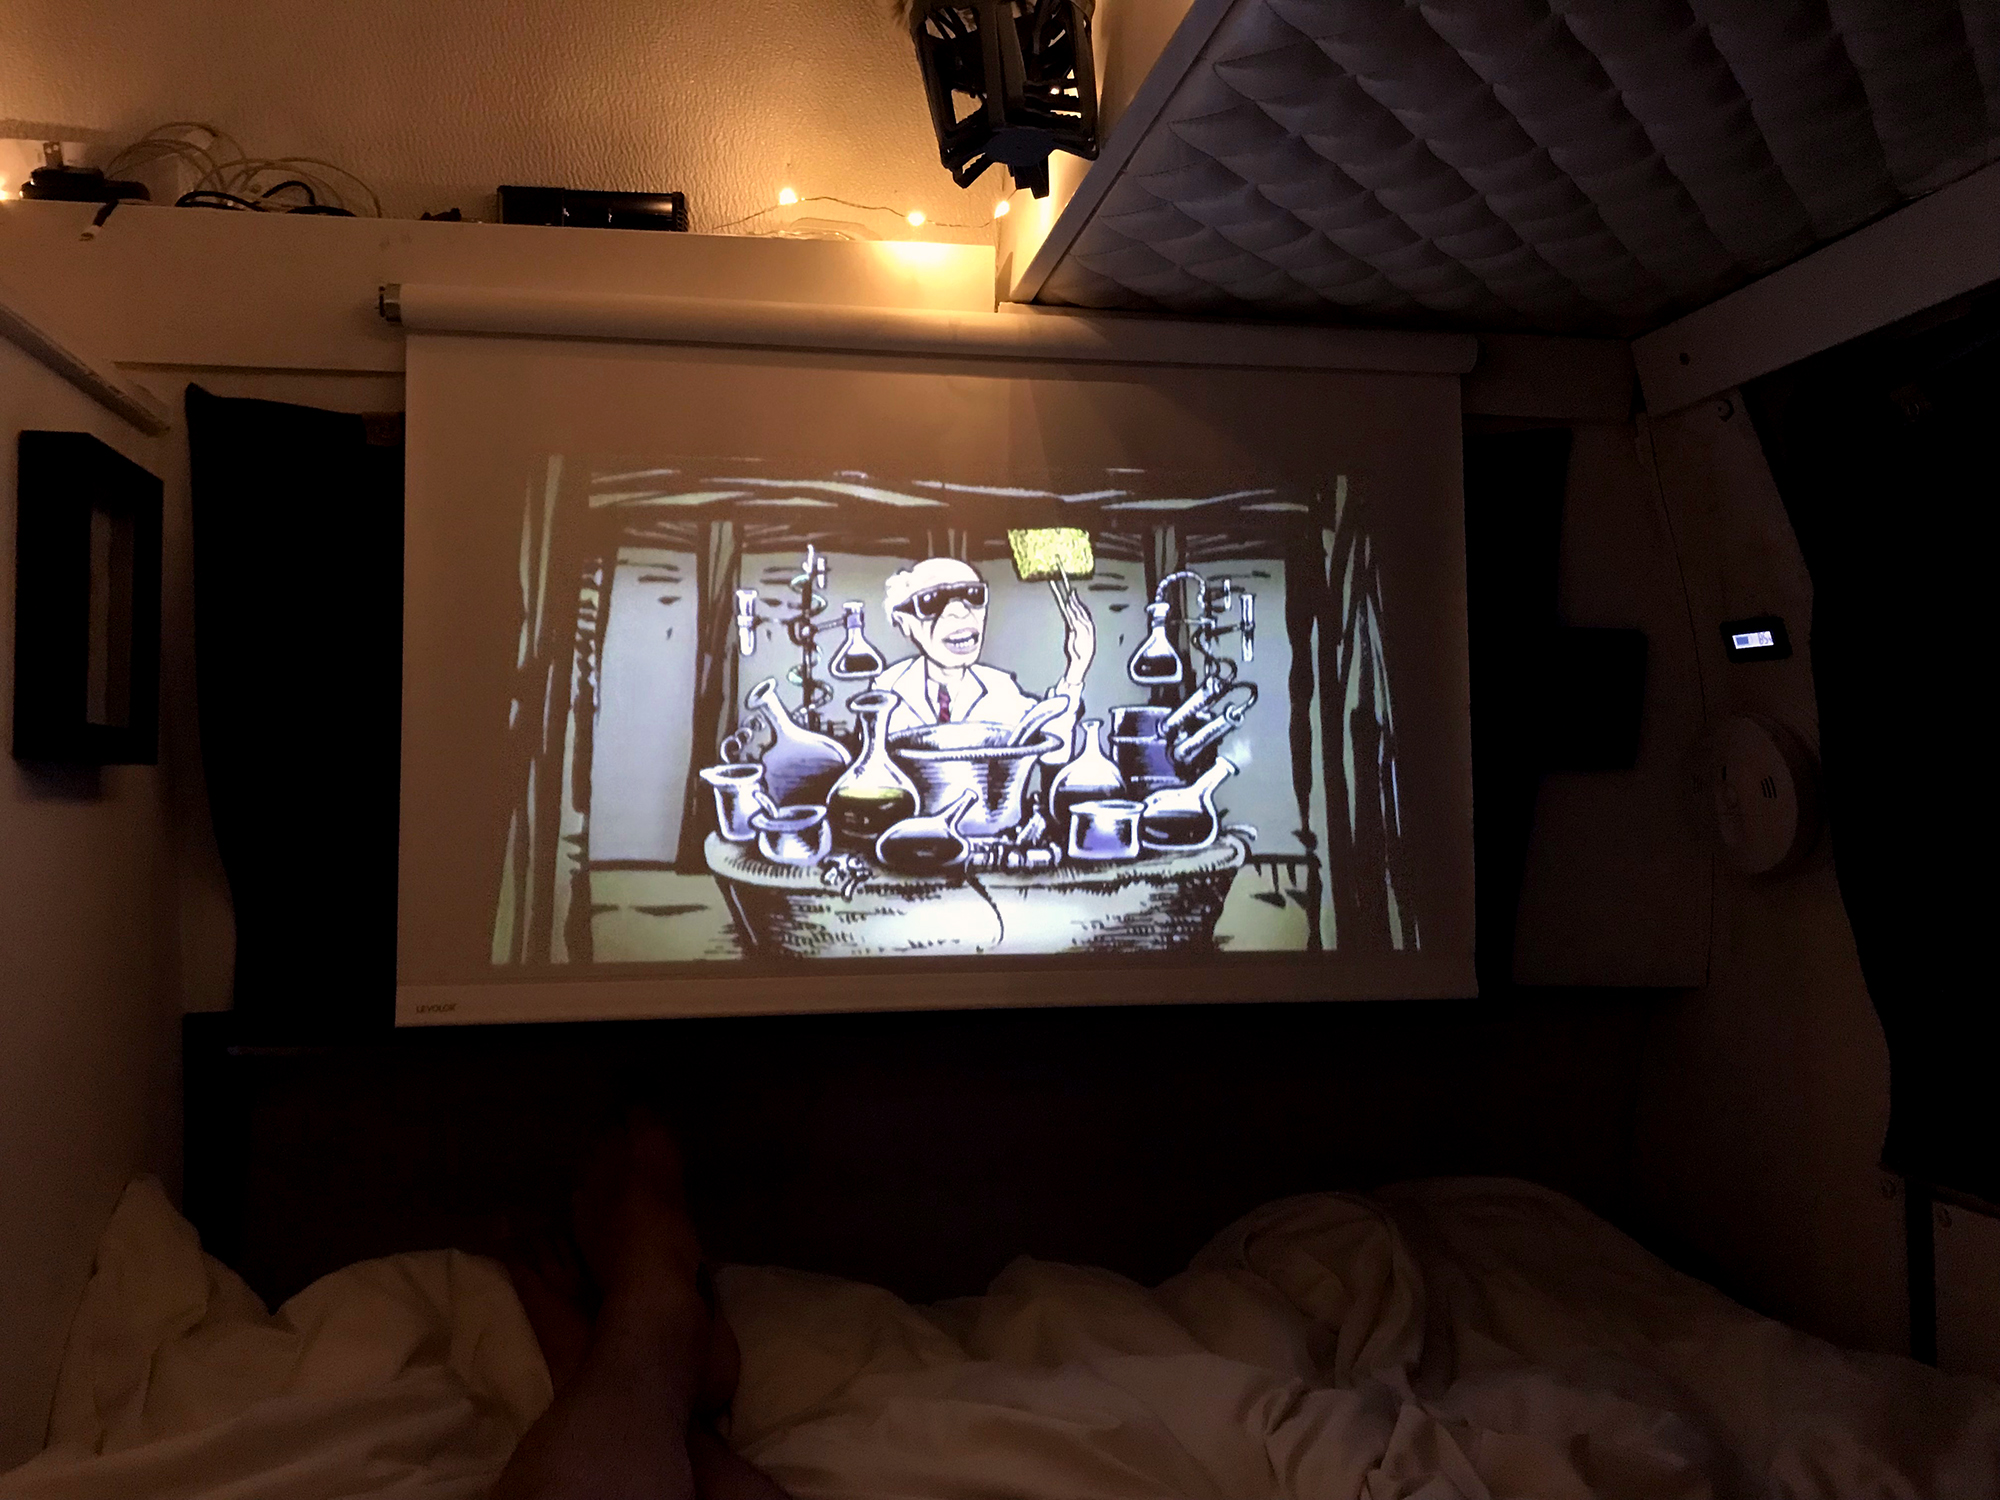 Generic Van Life - Albuquerque Projector